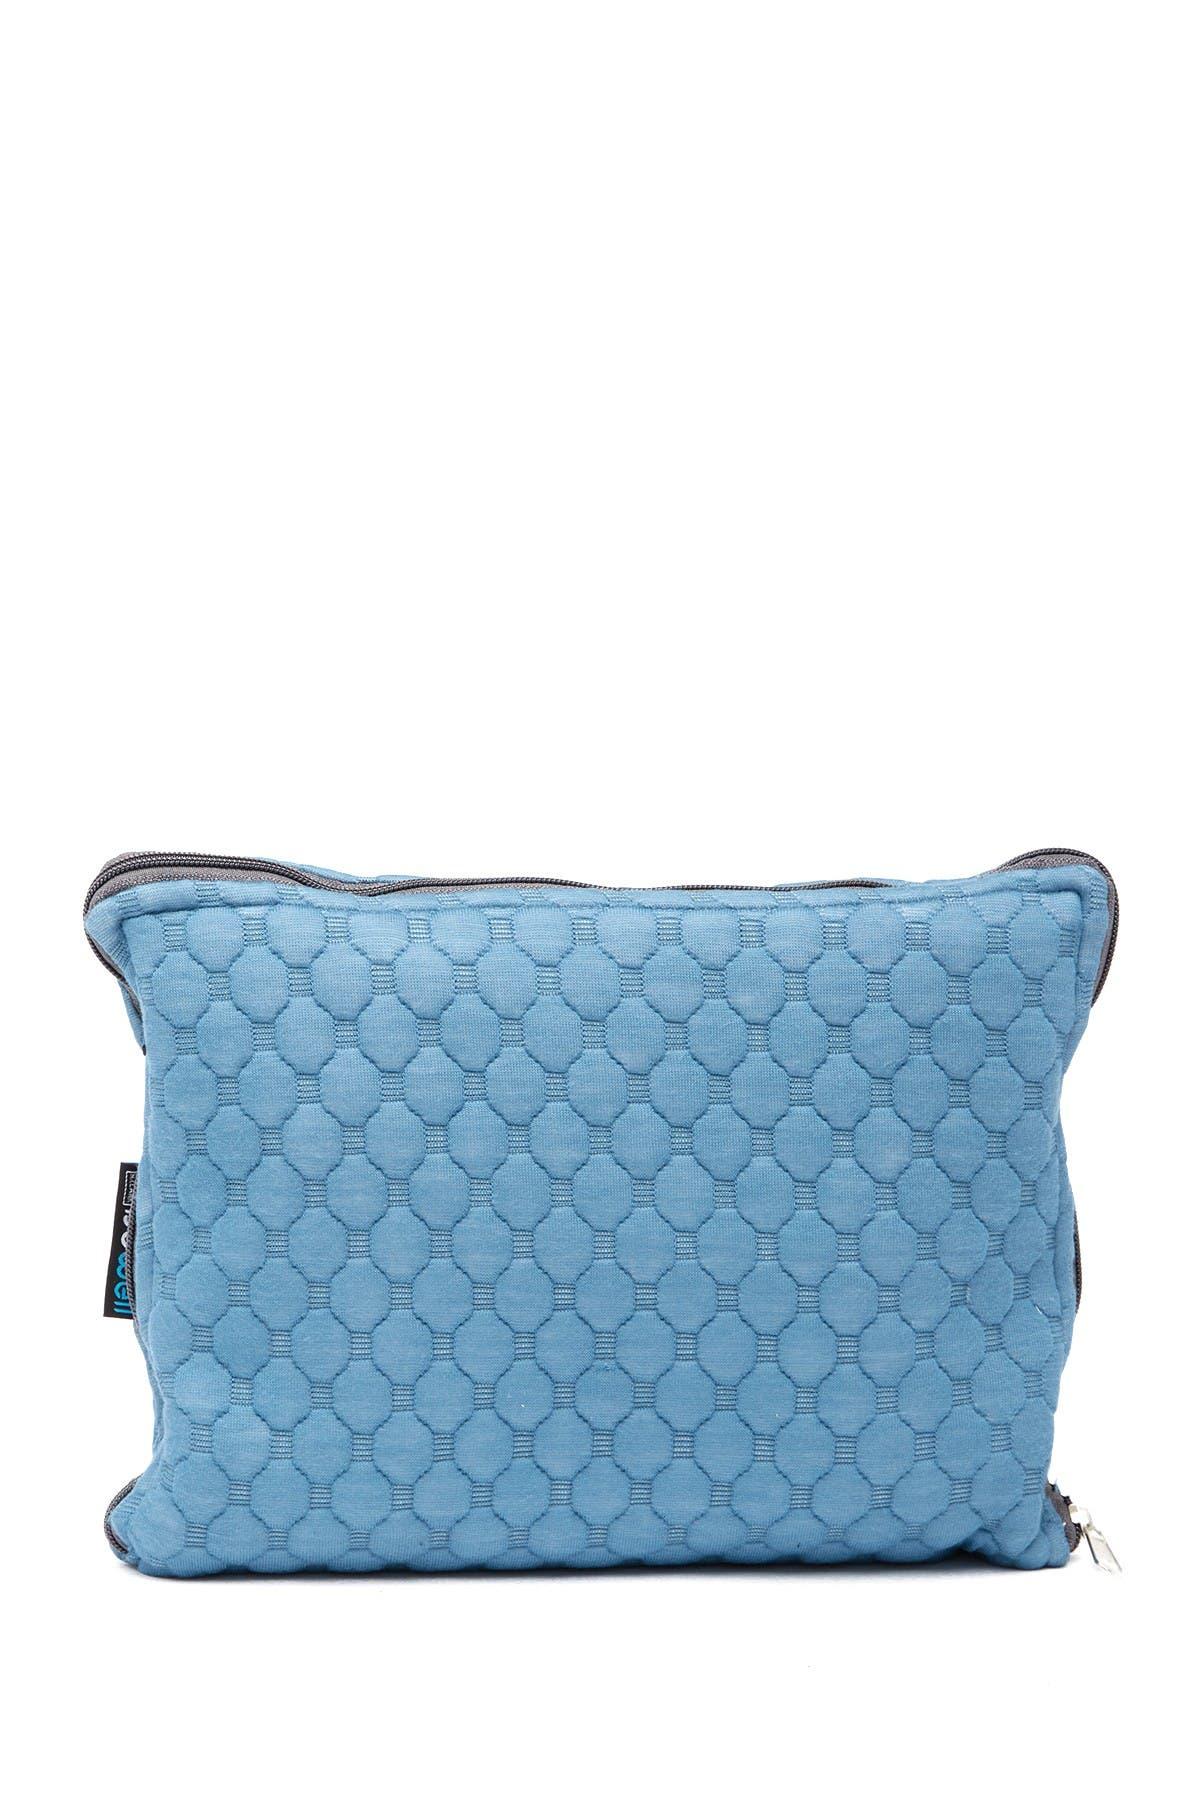 Image of LEWIS N CLARK Comfort Set